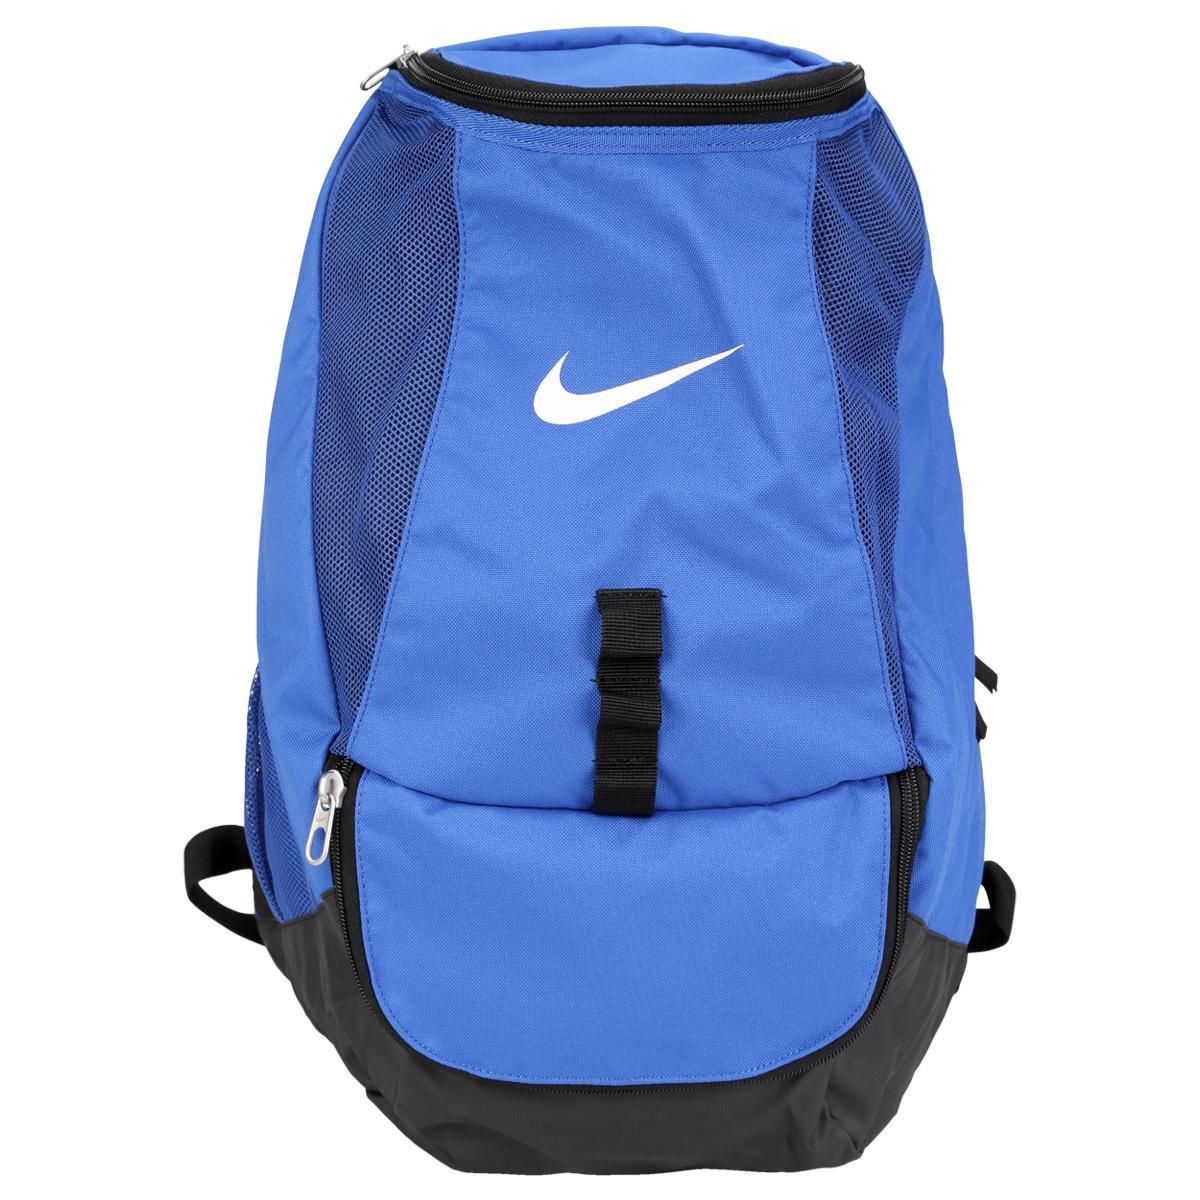 Mochila Nike Club Team Swoosh - Compre Agora  4d4b725555c27